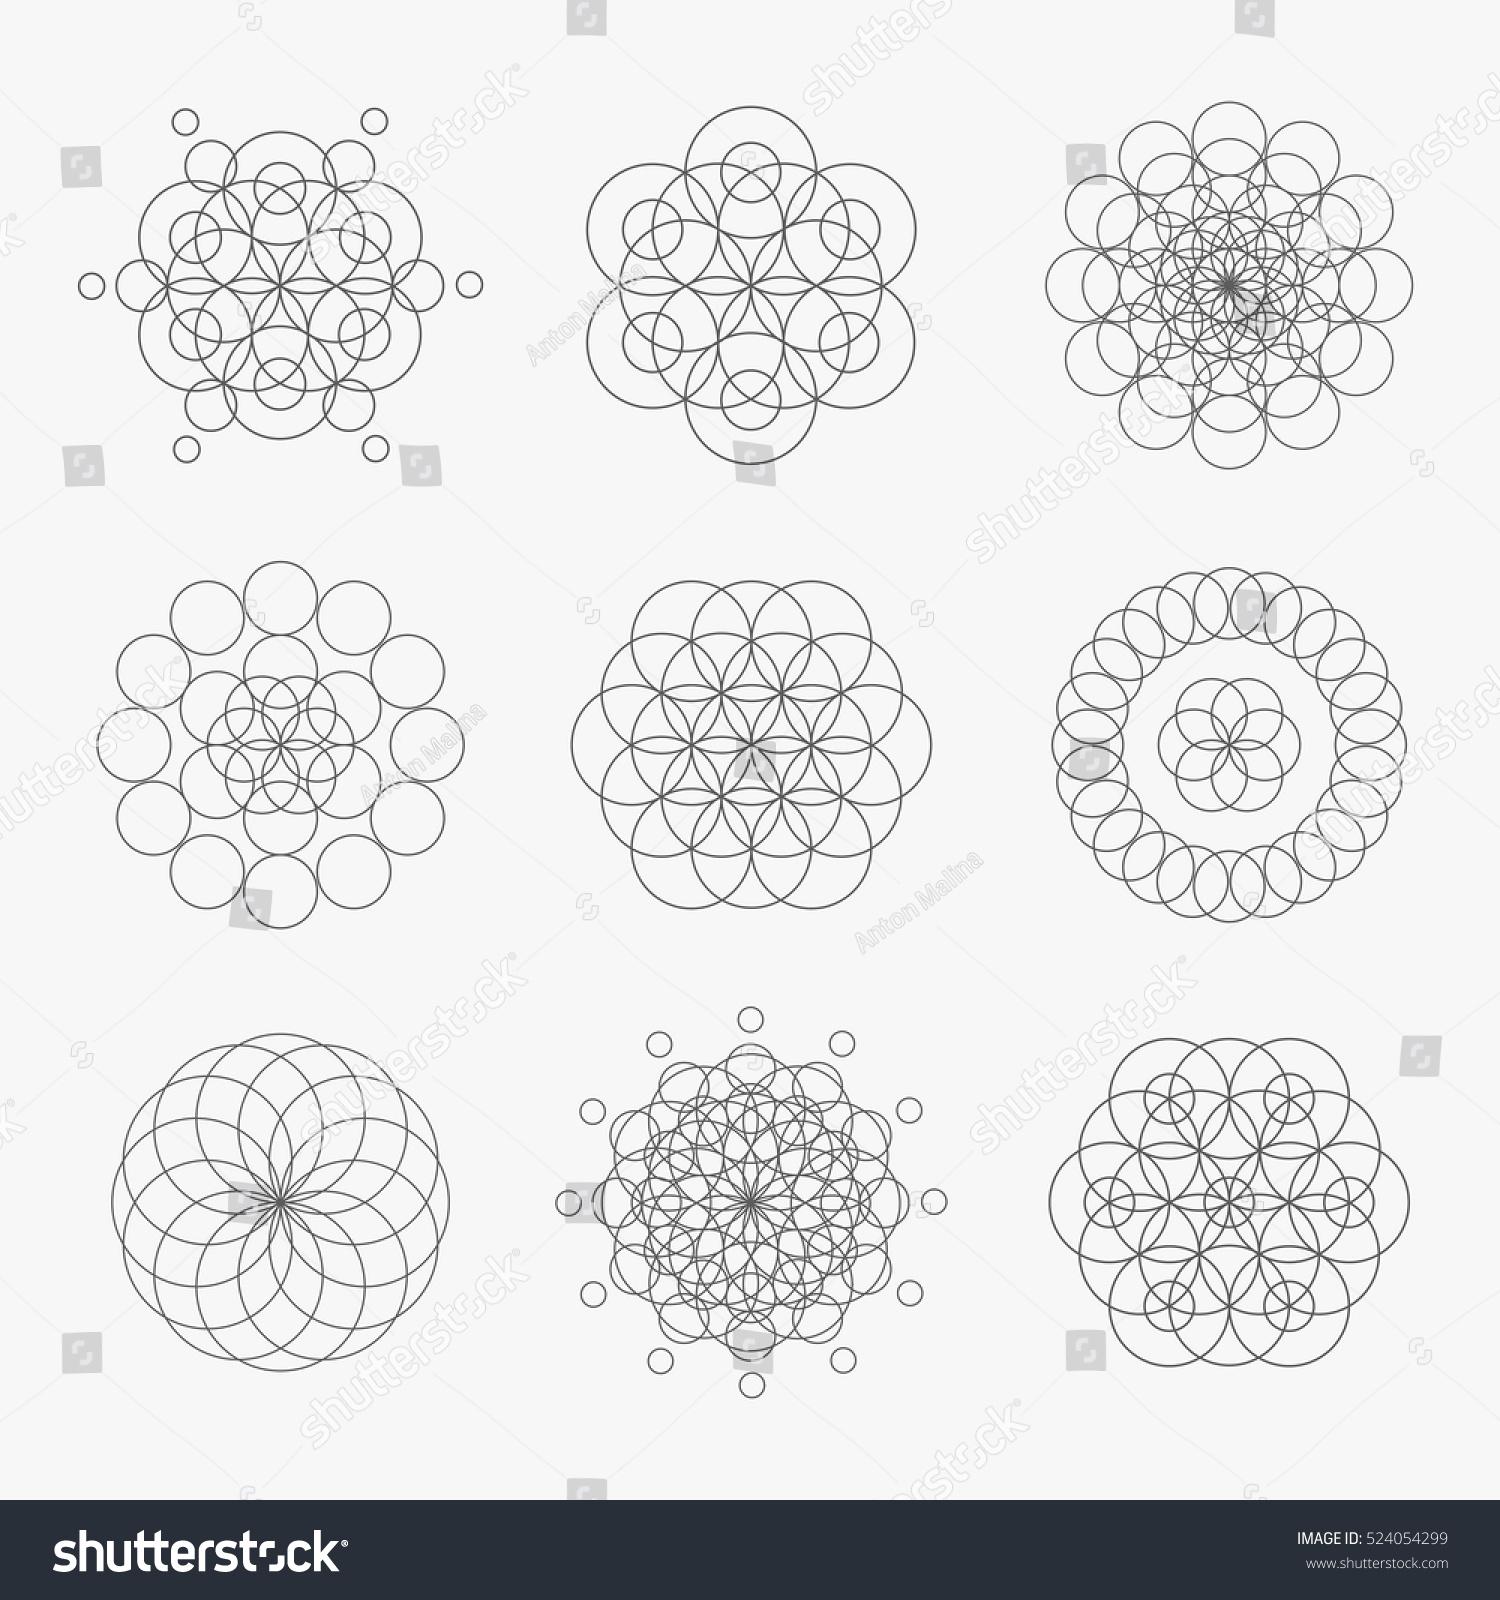 Geometric Circle Patterns Unique Inspiration